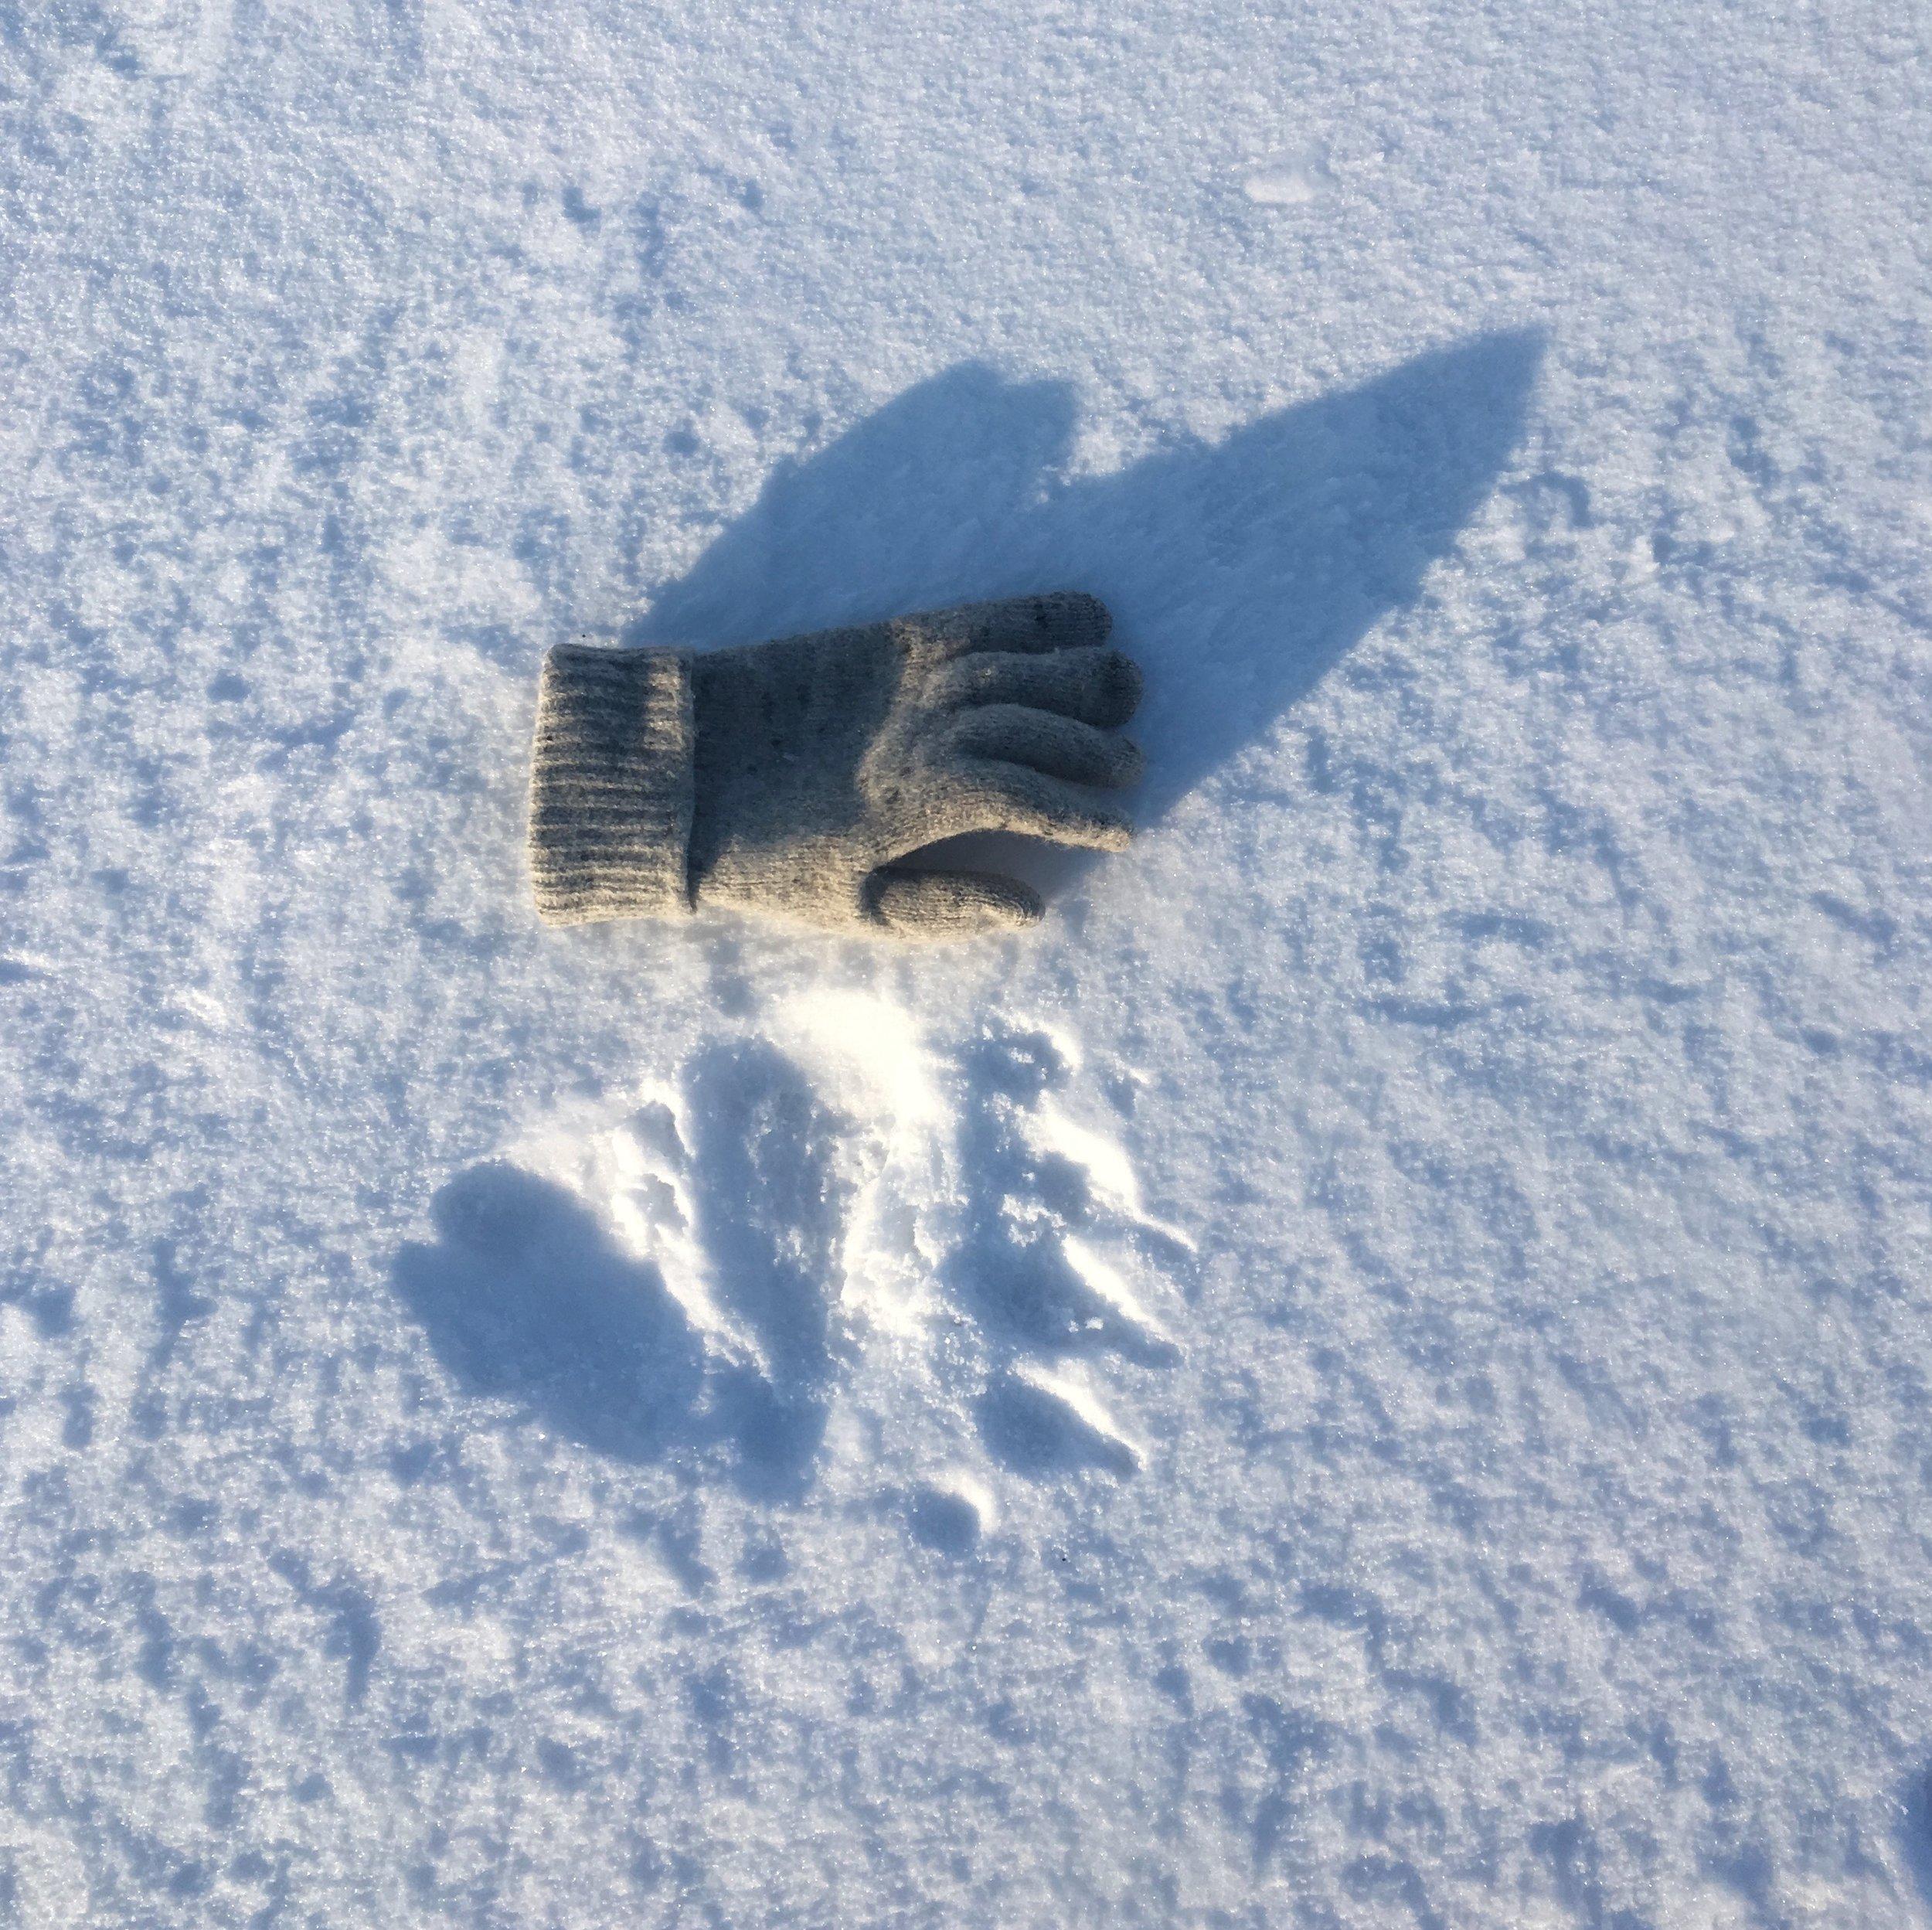 Polar bear print and wool glove on frozen Billefjorden, Svalbard, 2018. Photograph: Dan Richards